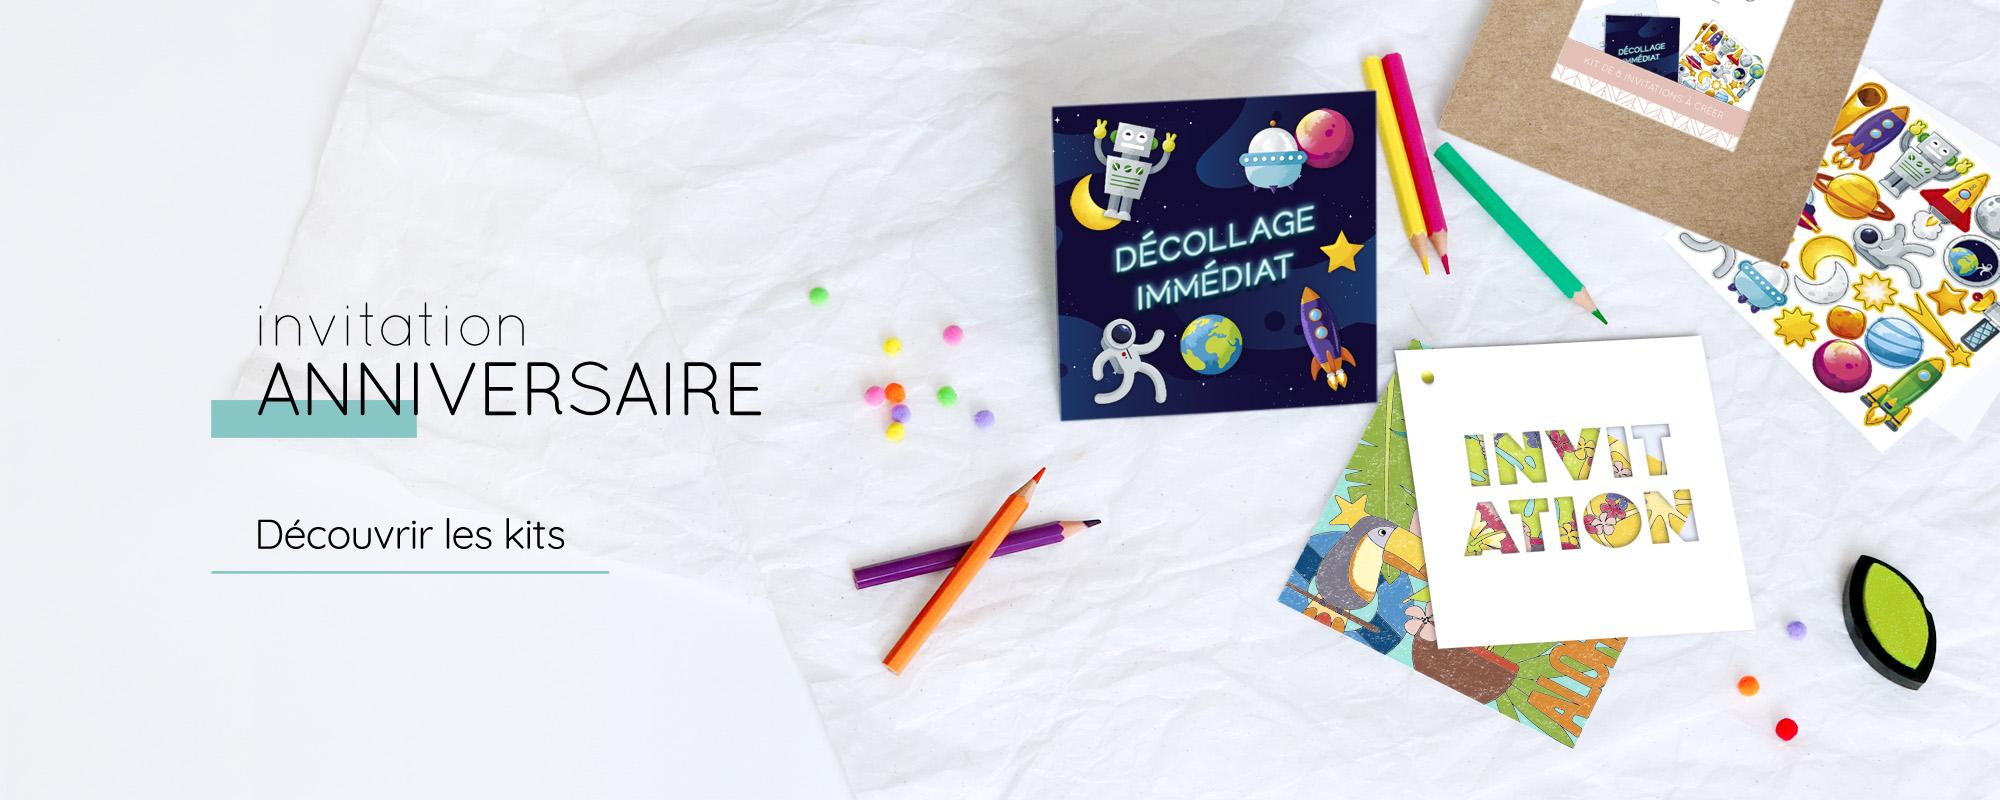 jolijourj-accueil-slider-invit-enfant-3